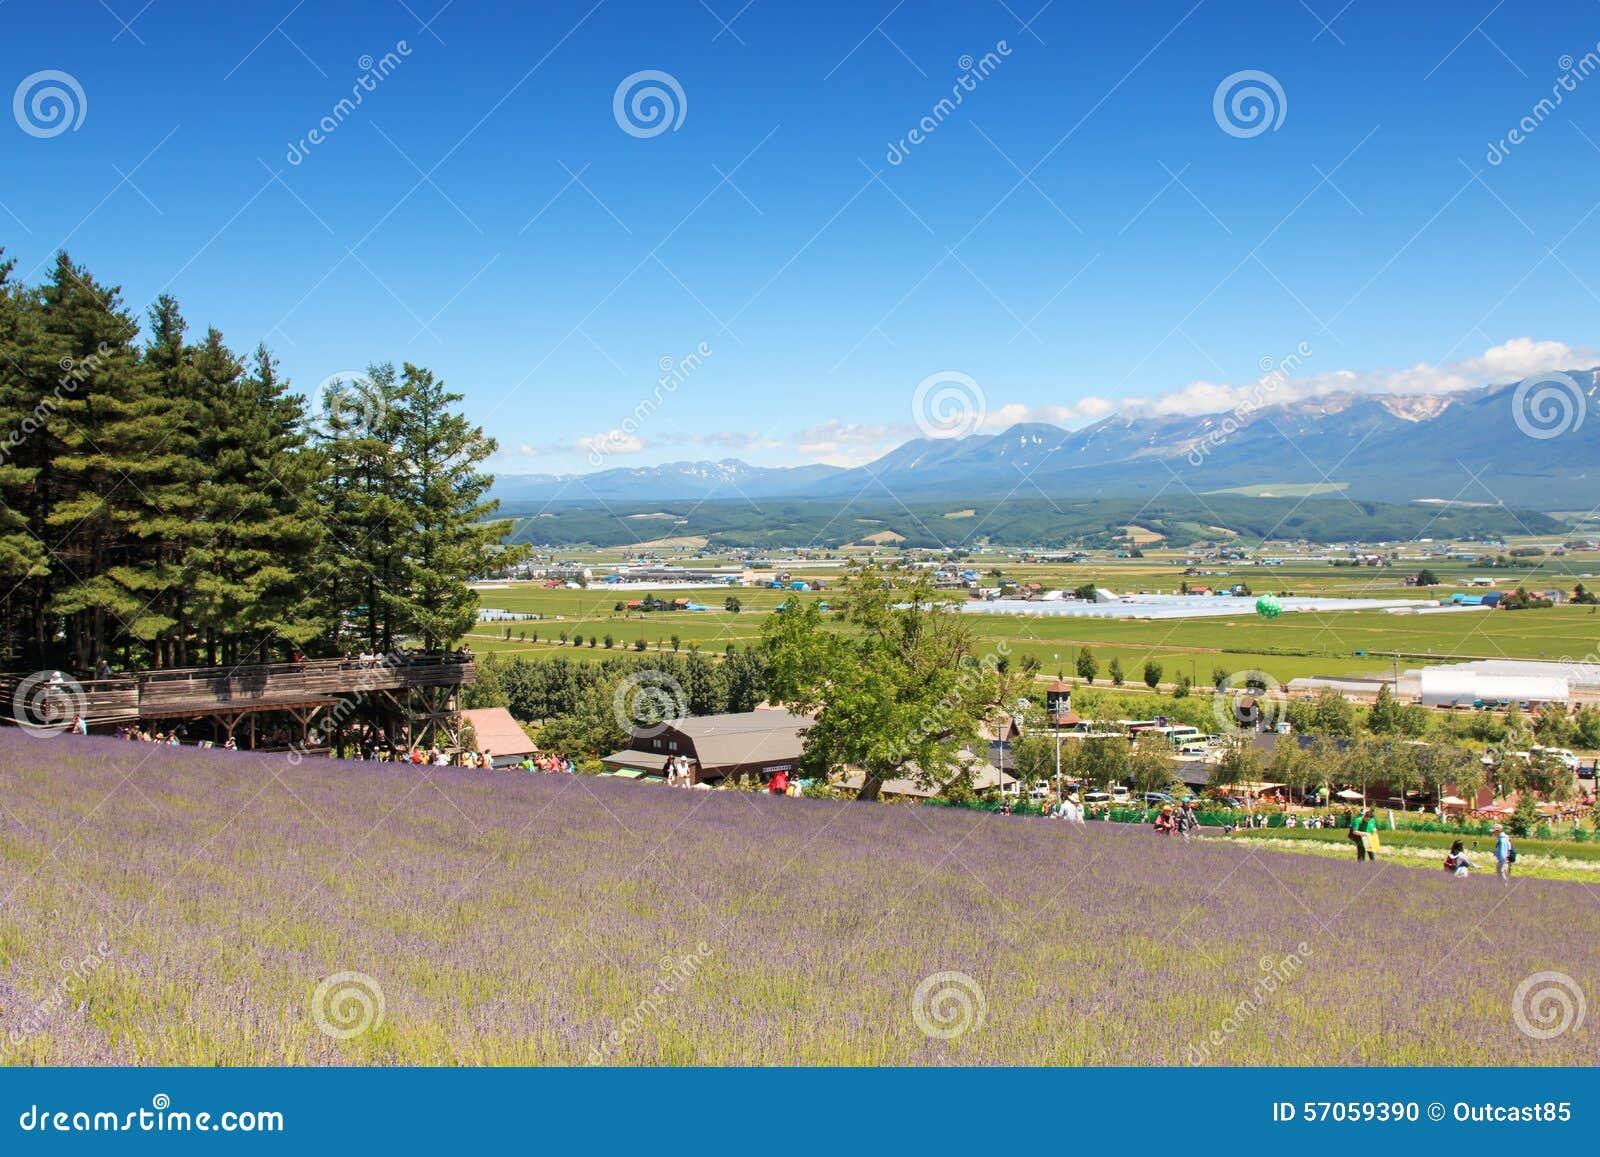 Lavendelgebied in Furano, Hokkaido met sommige toeristen die langs op de achtergrond lopen